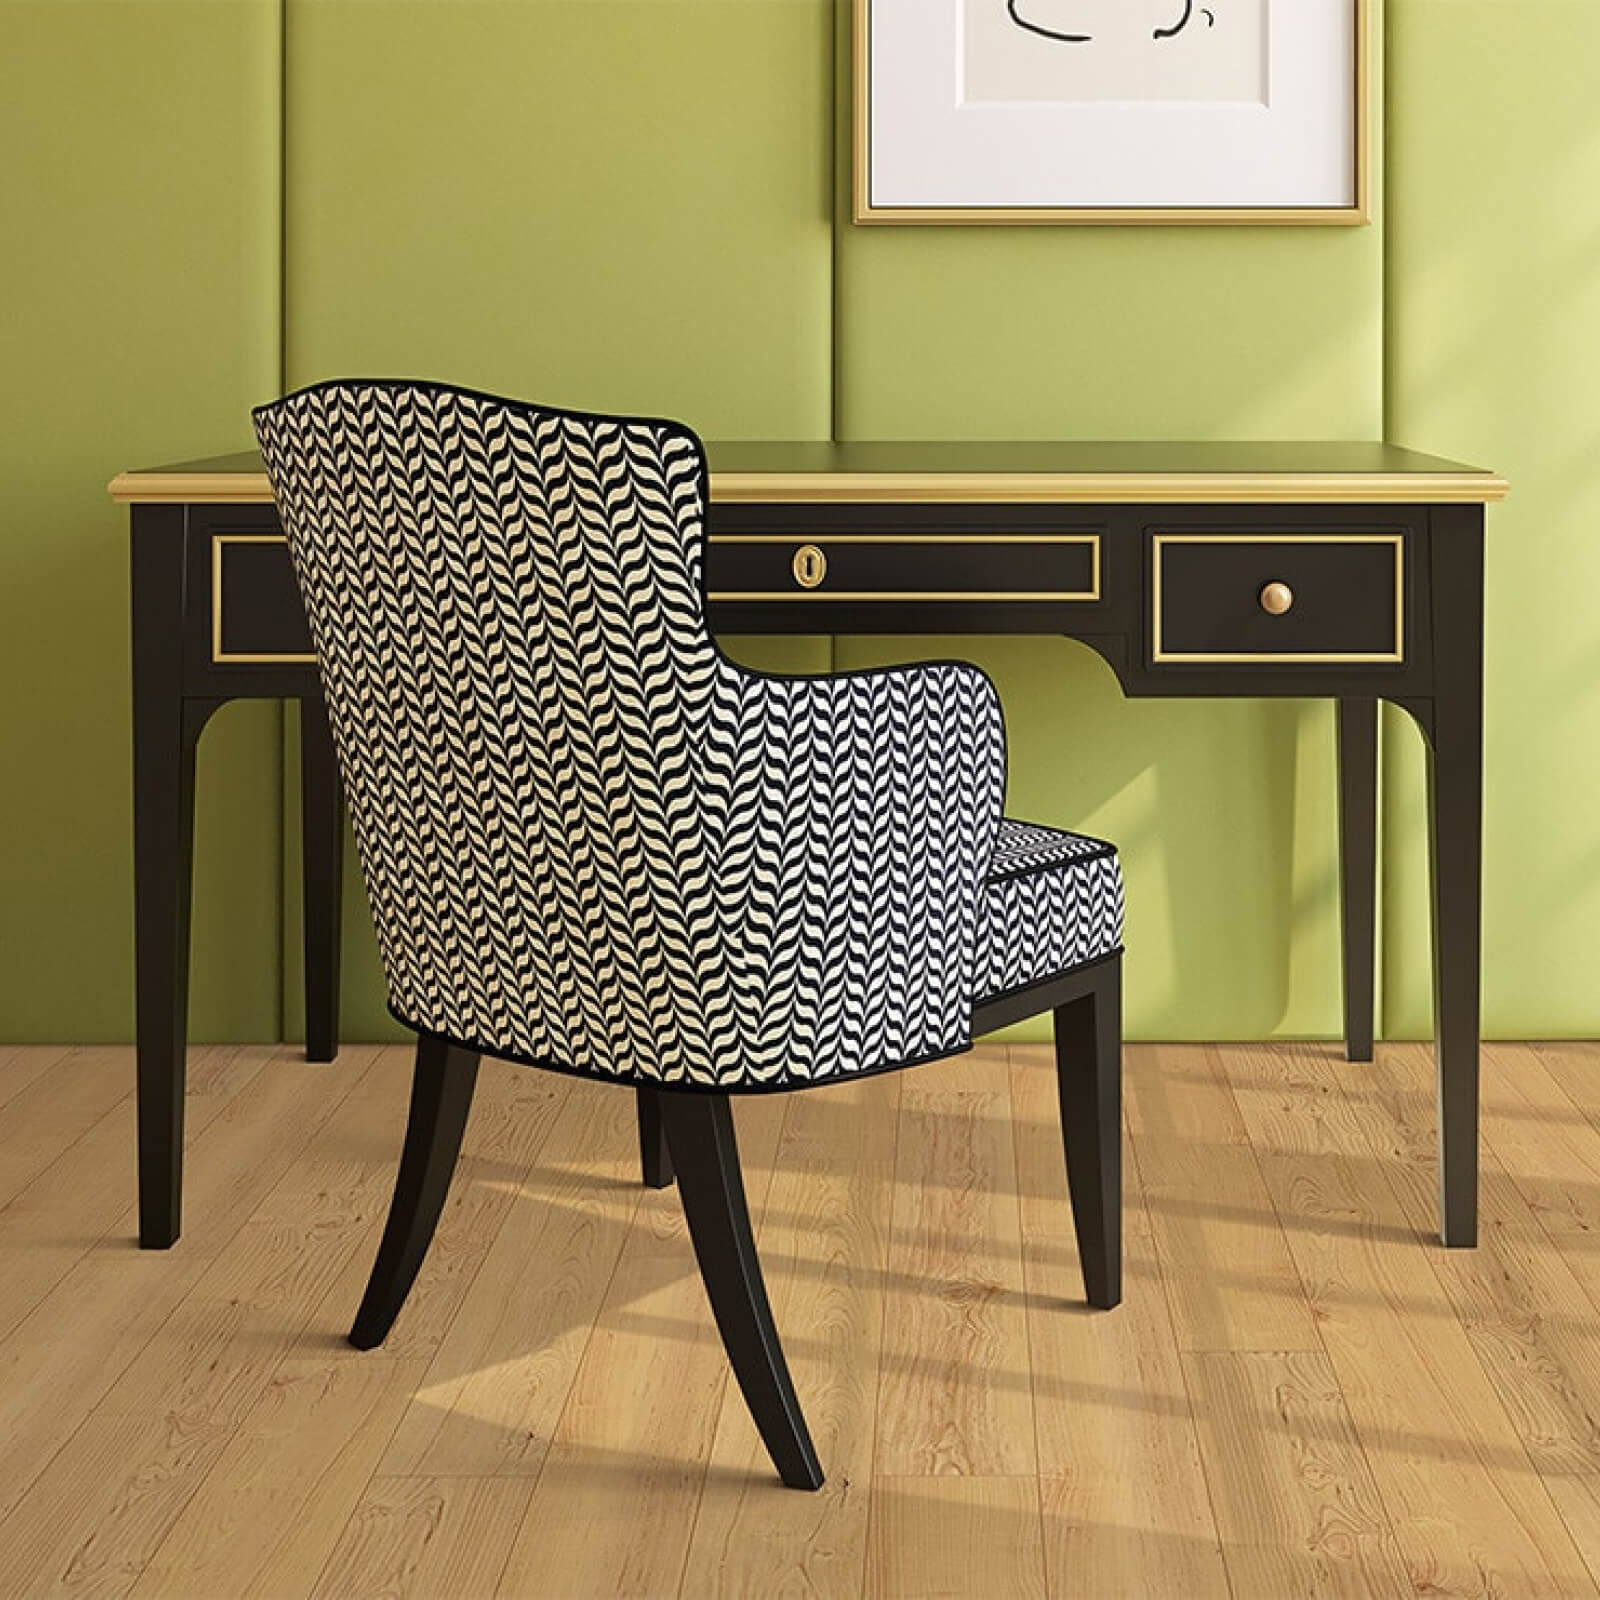 Study Table | McSwain Carpet & Floors